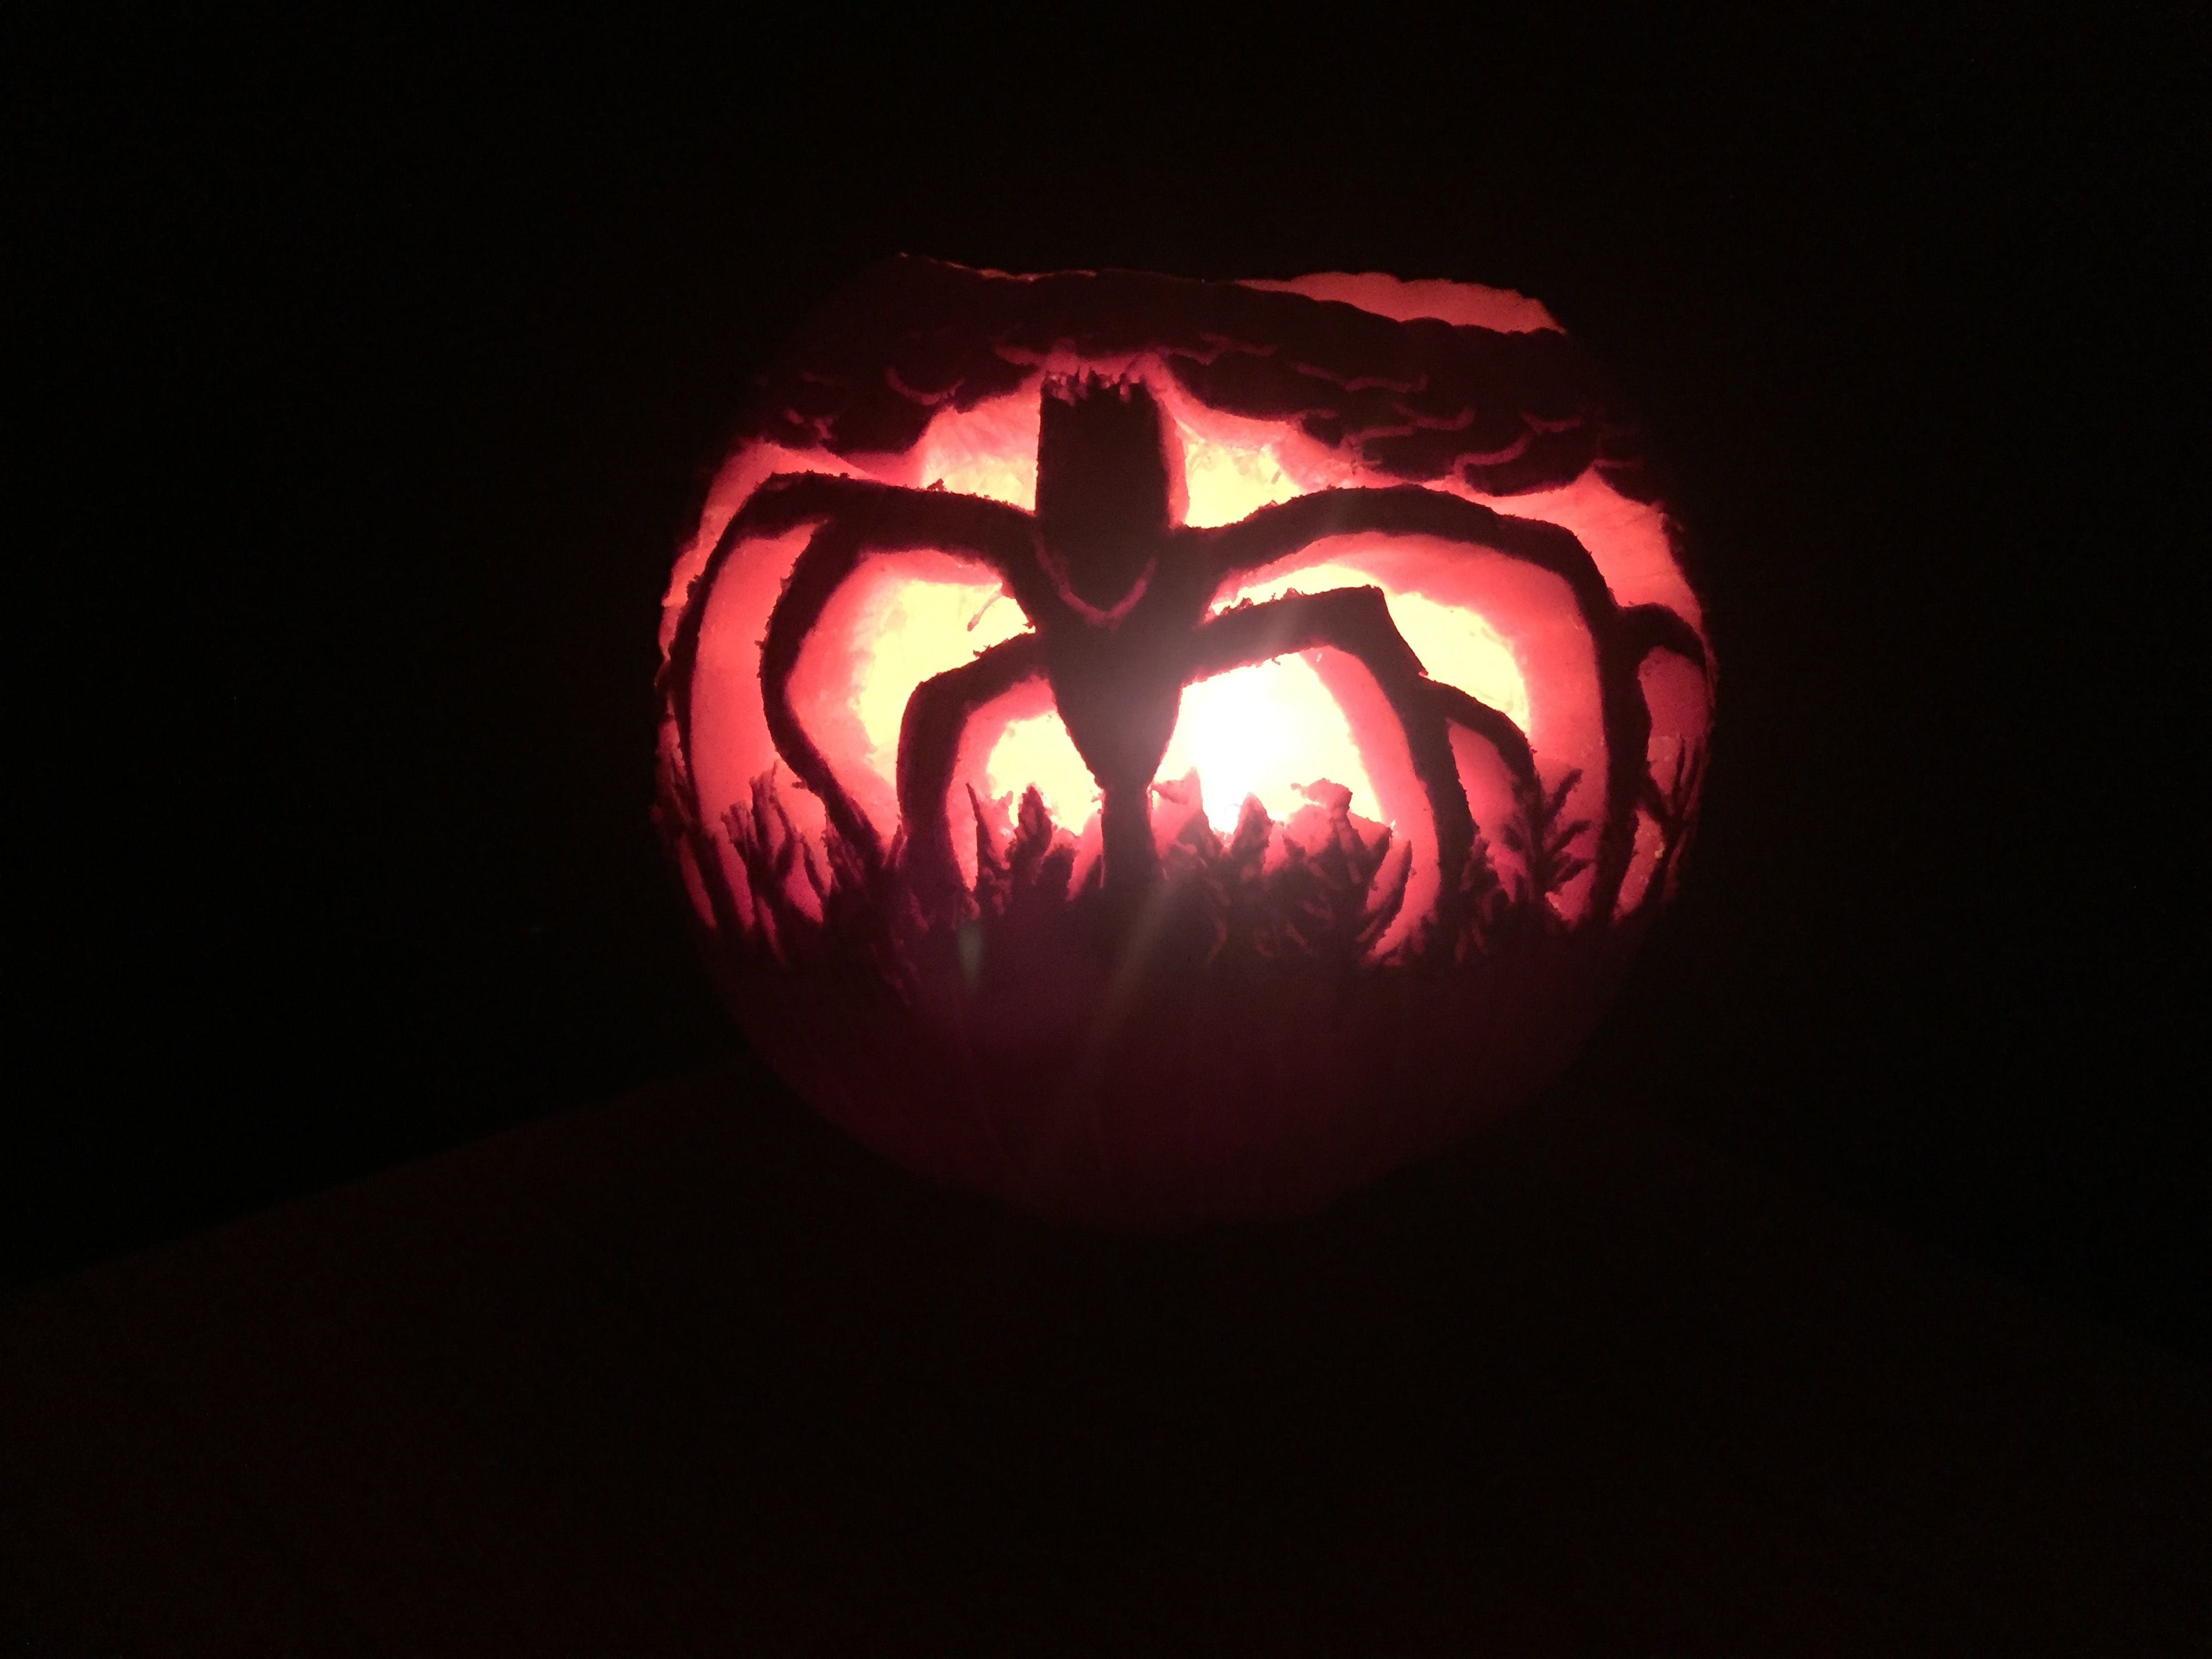 pumpkin template stranger things  Stranger things pumpkin carving of Wills Monster by Tanya ...